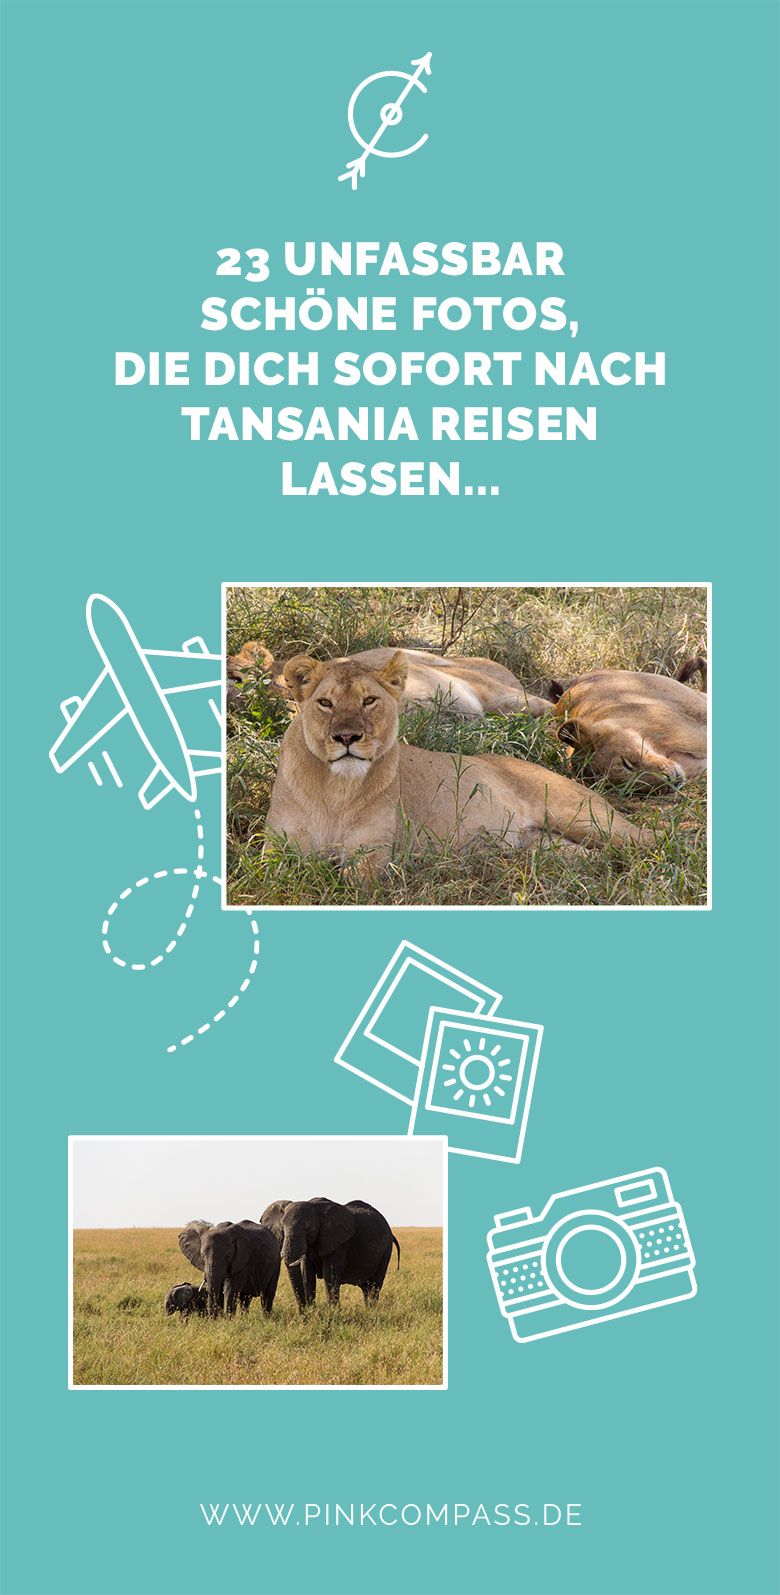 Pink Compass Tansania Safari Bilder